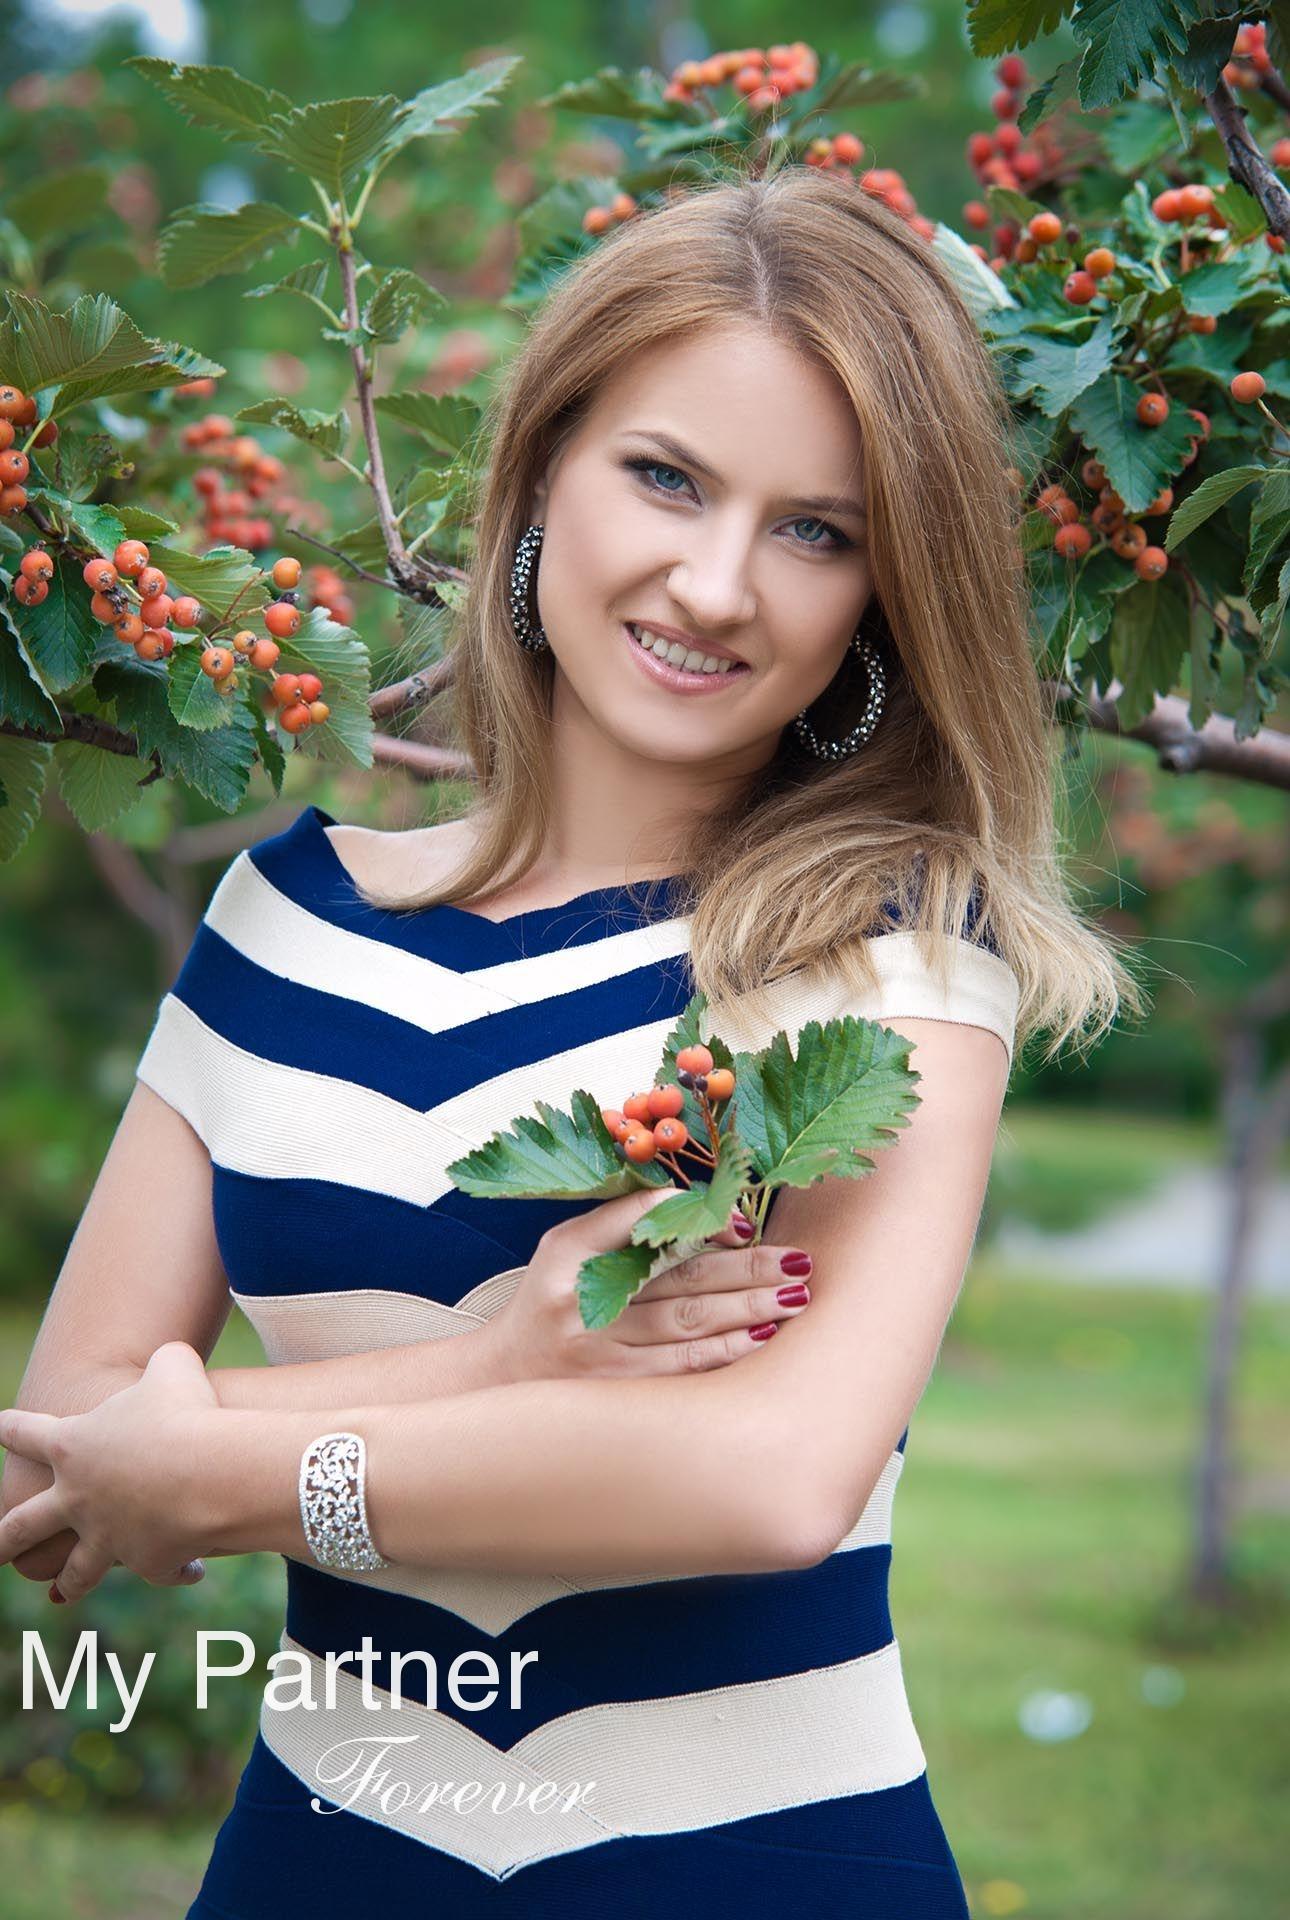 Dating Site to Meet Elena from Zaporozhye, Ukraine